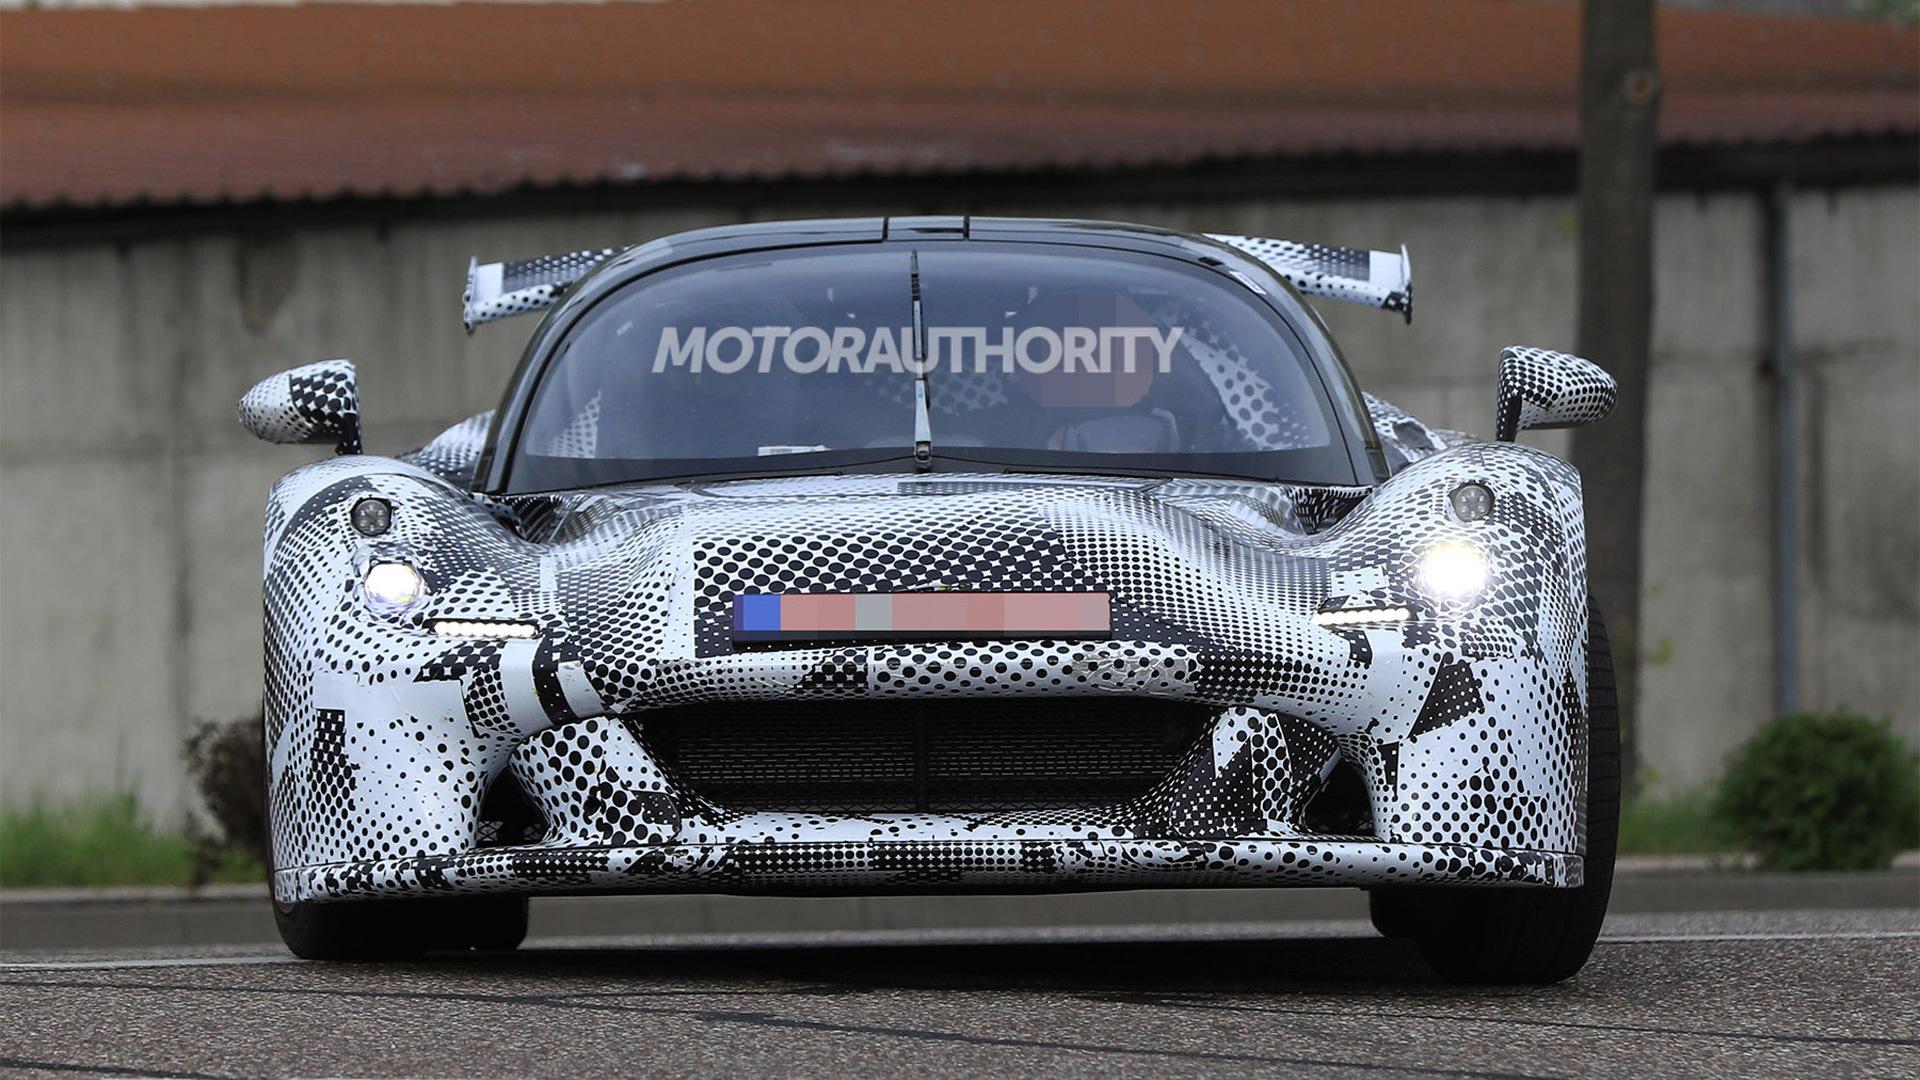 2018 Dallara sports car spy shots - Image via S. Baldauf/SB-Medien